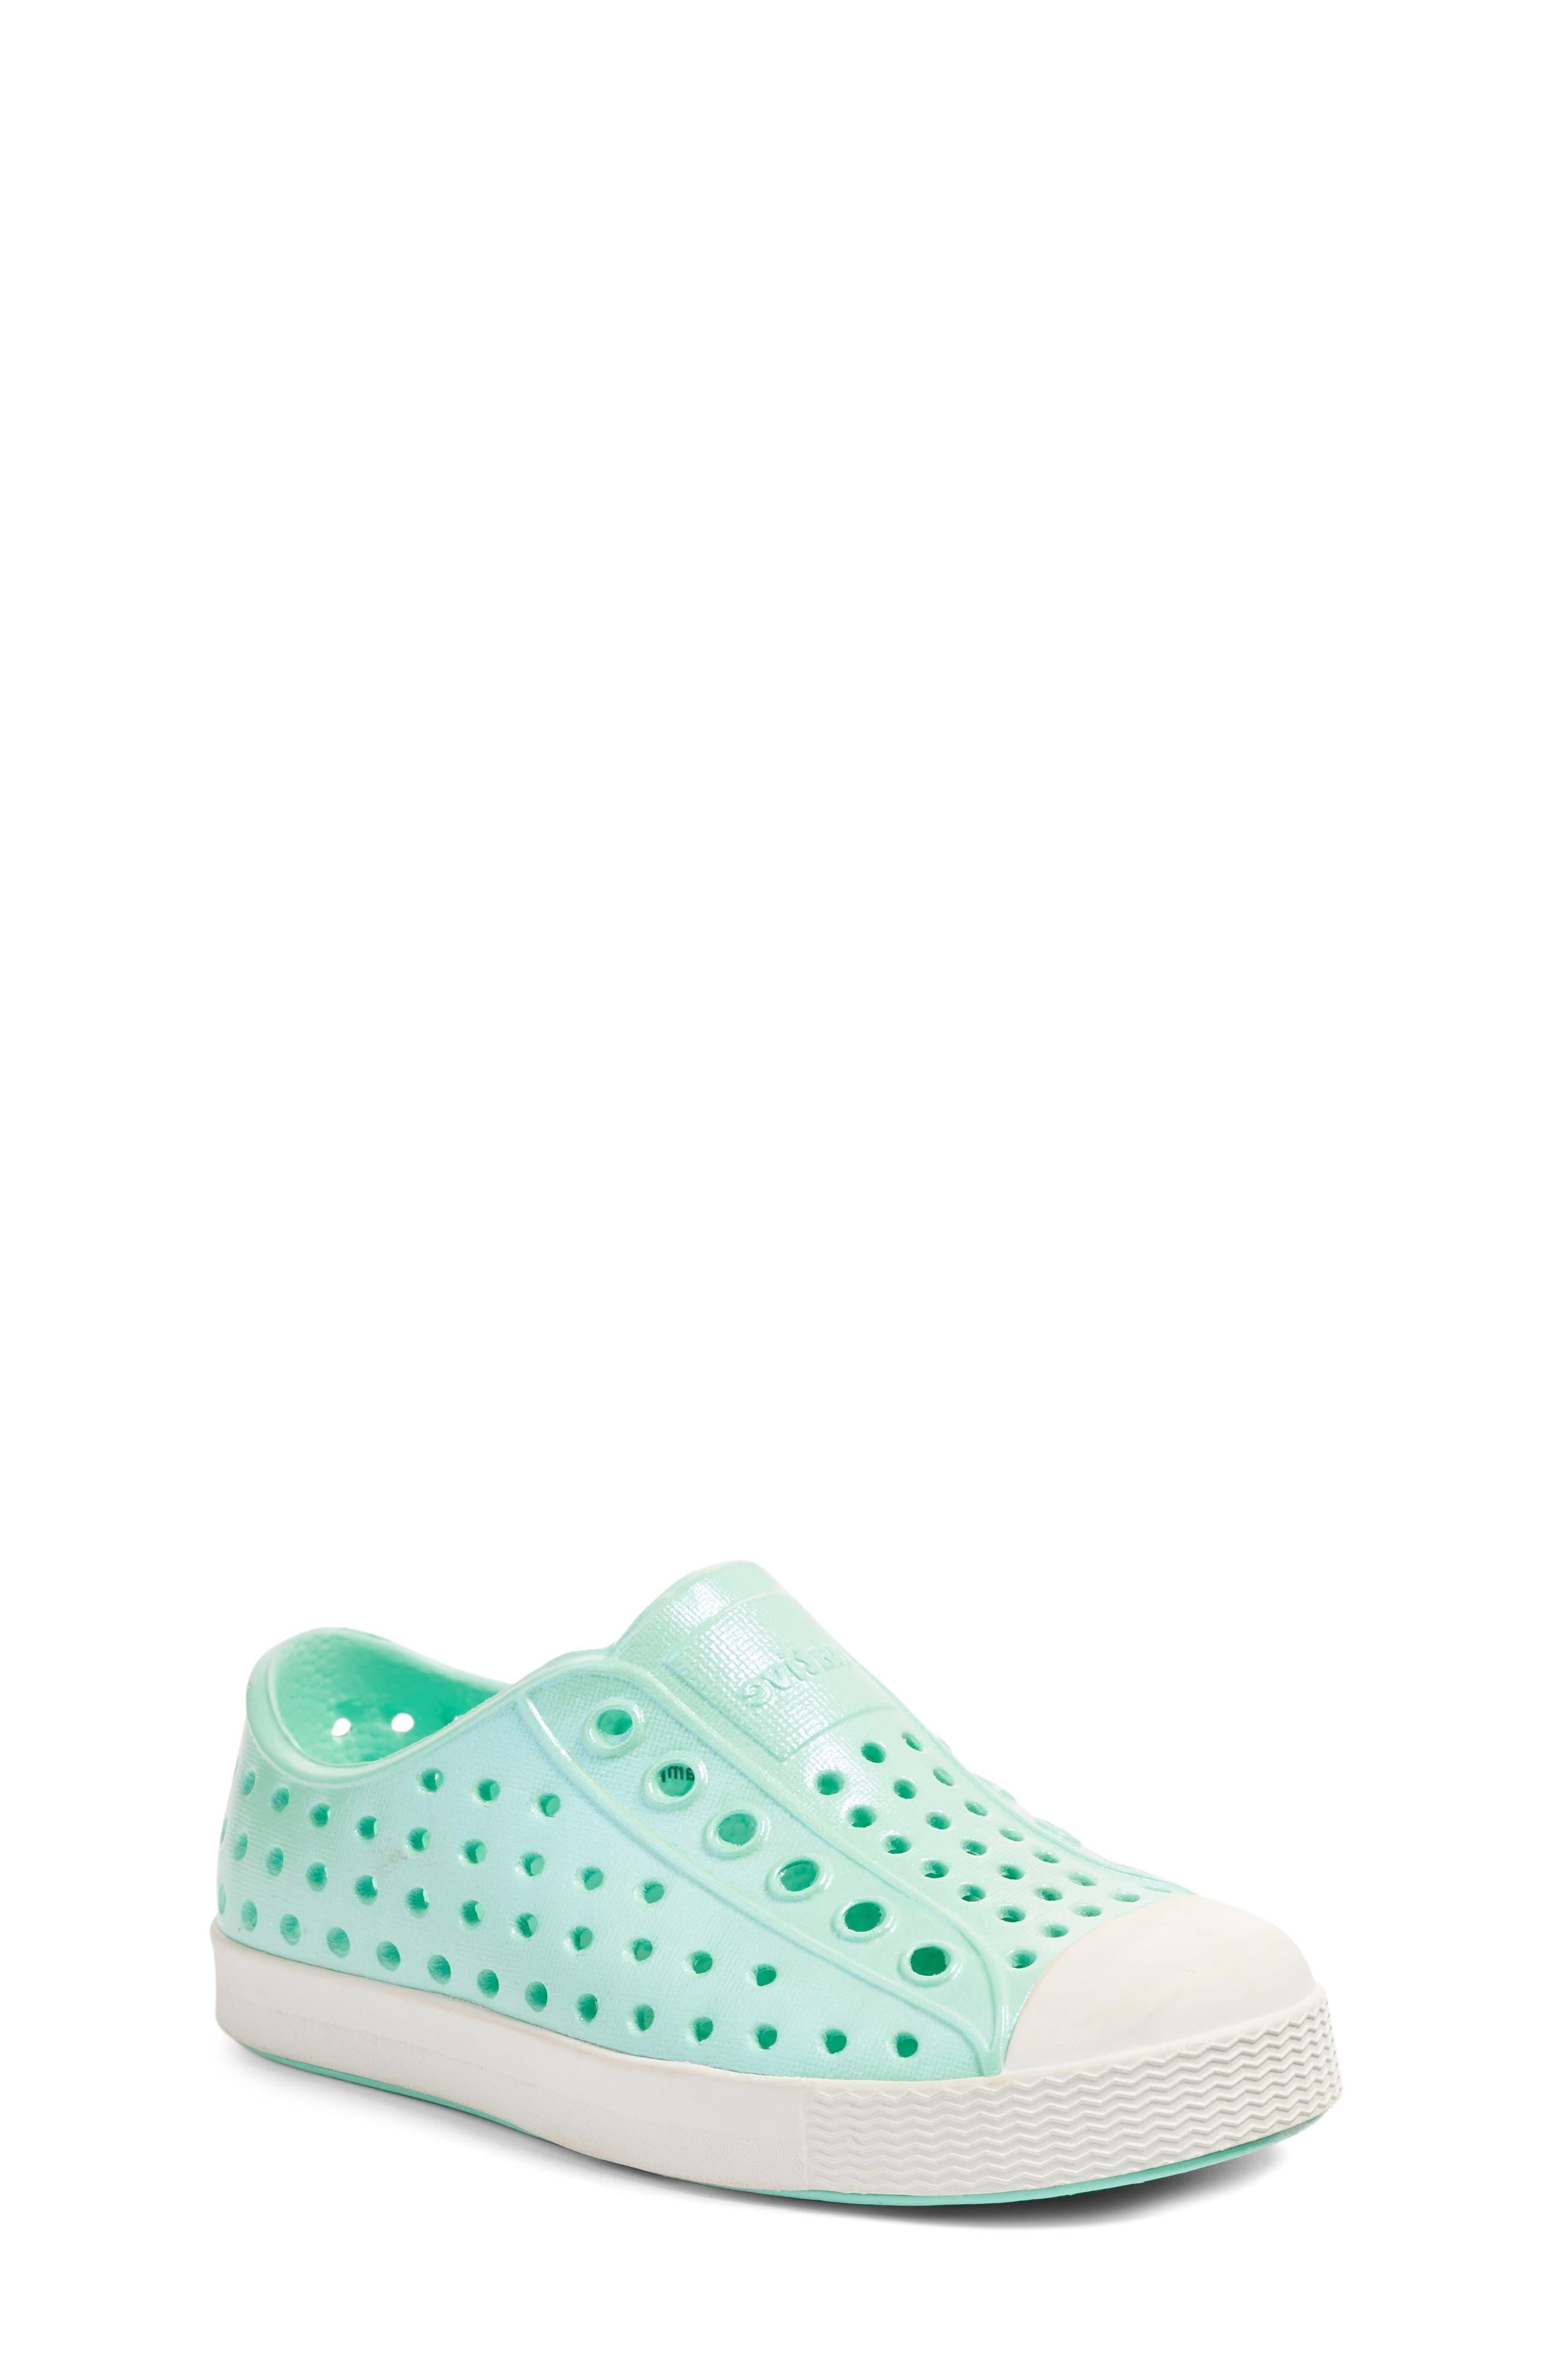 Main Image - Native Shoes 'Jefferson' Iridescent Slip-On Sneaker (Baby, Walker, Toddler & Little Kid)